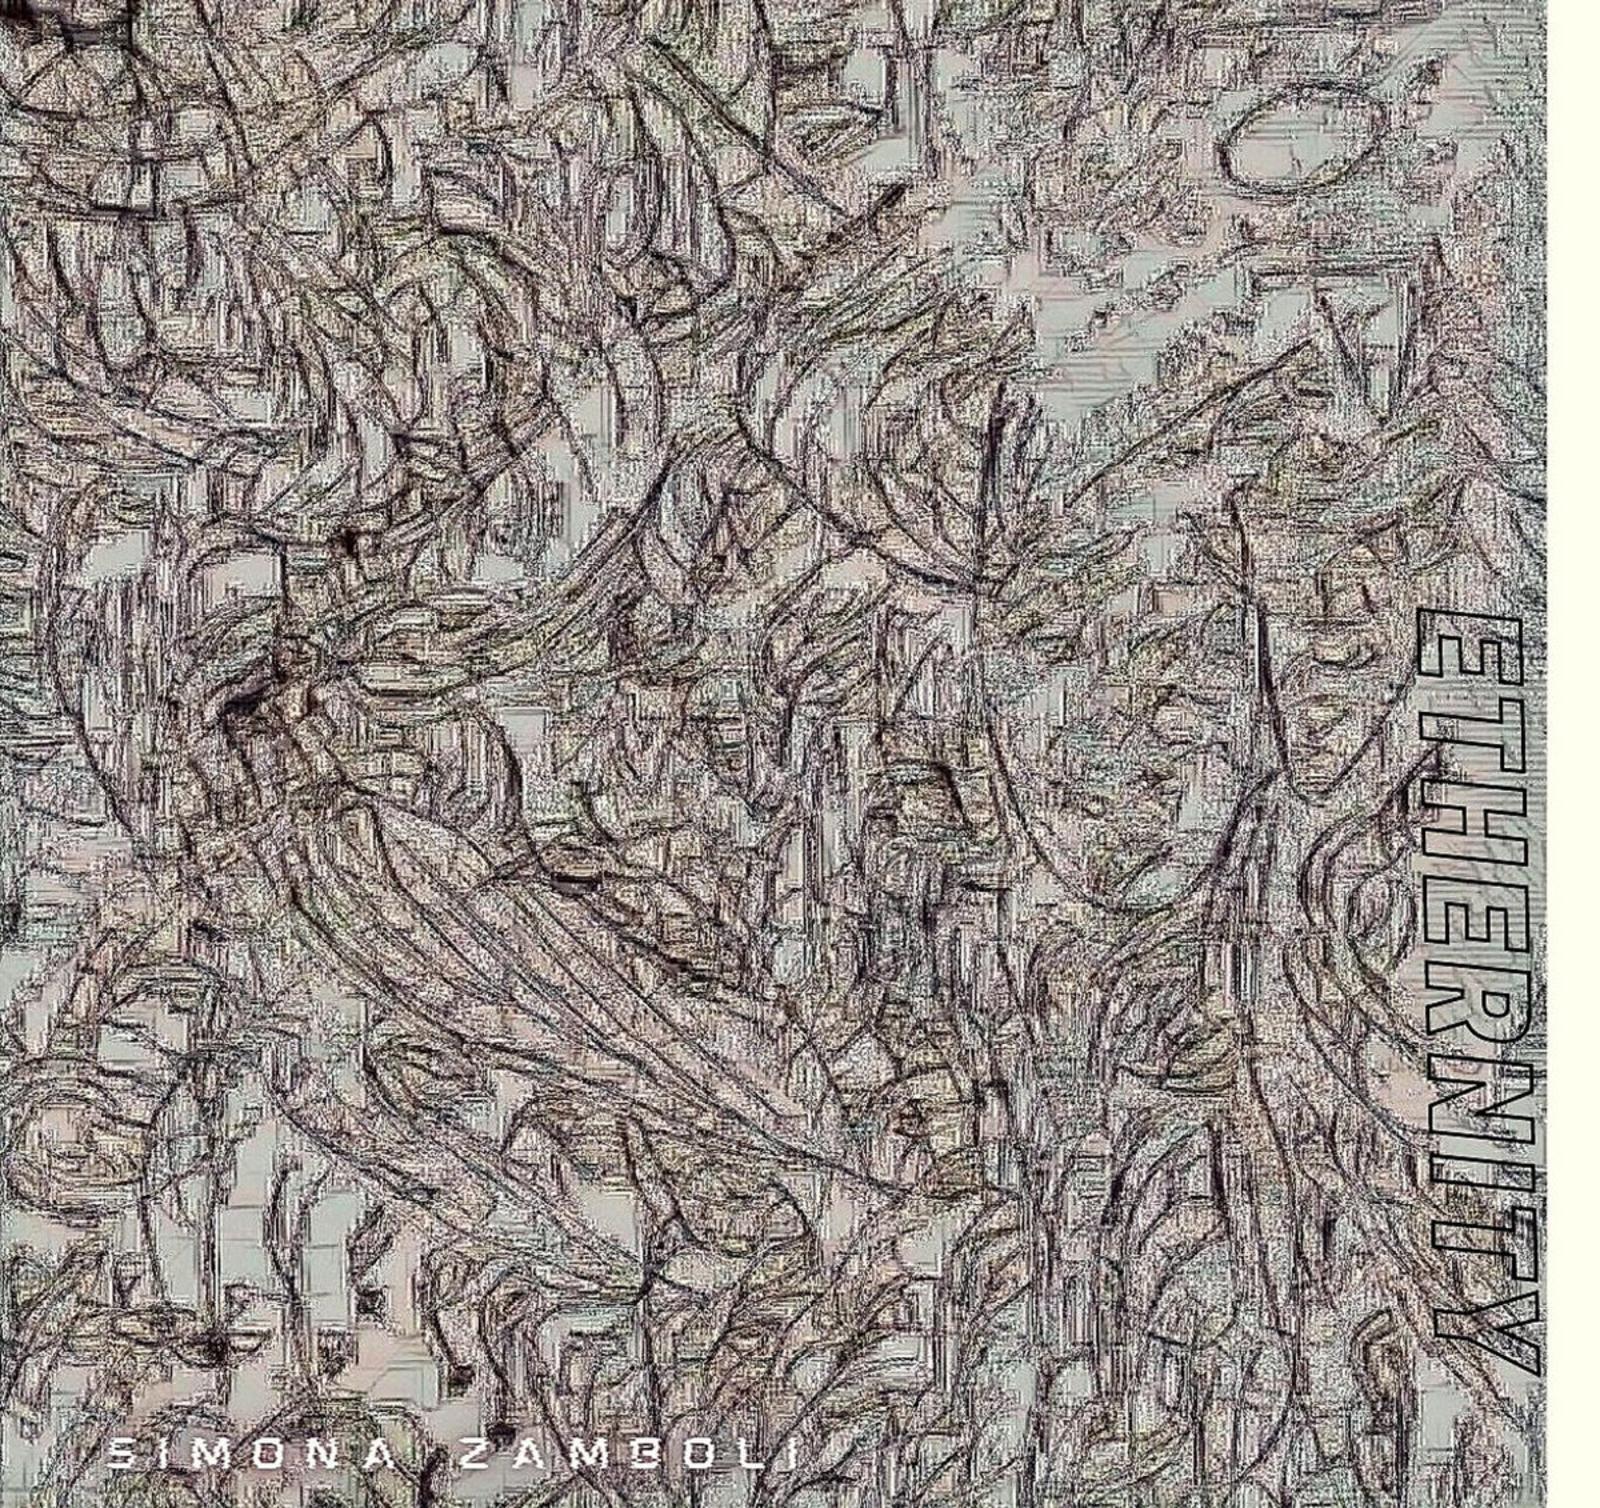 gdw 8 Simona Zamboli – Ethernity Artwork